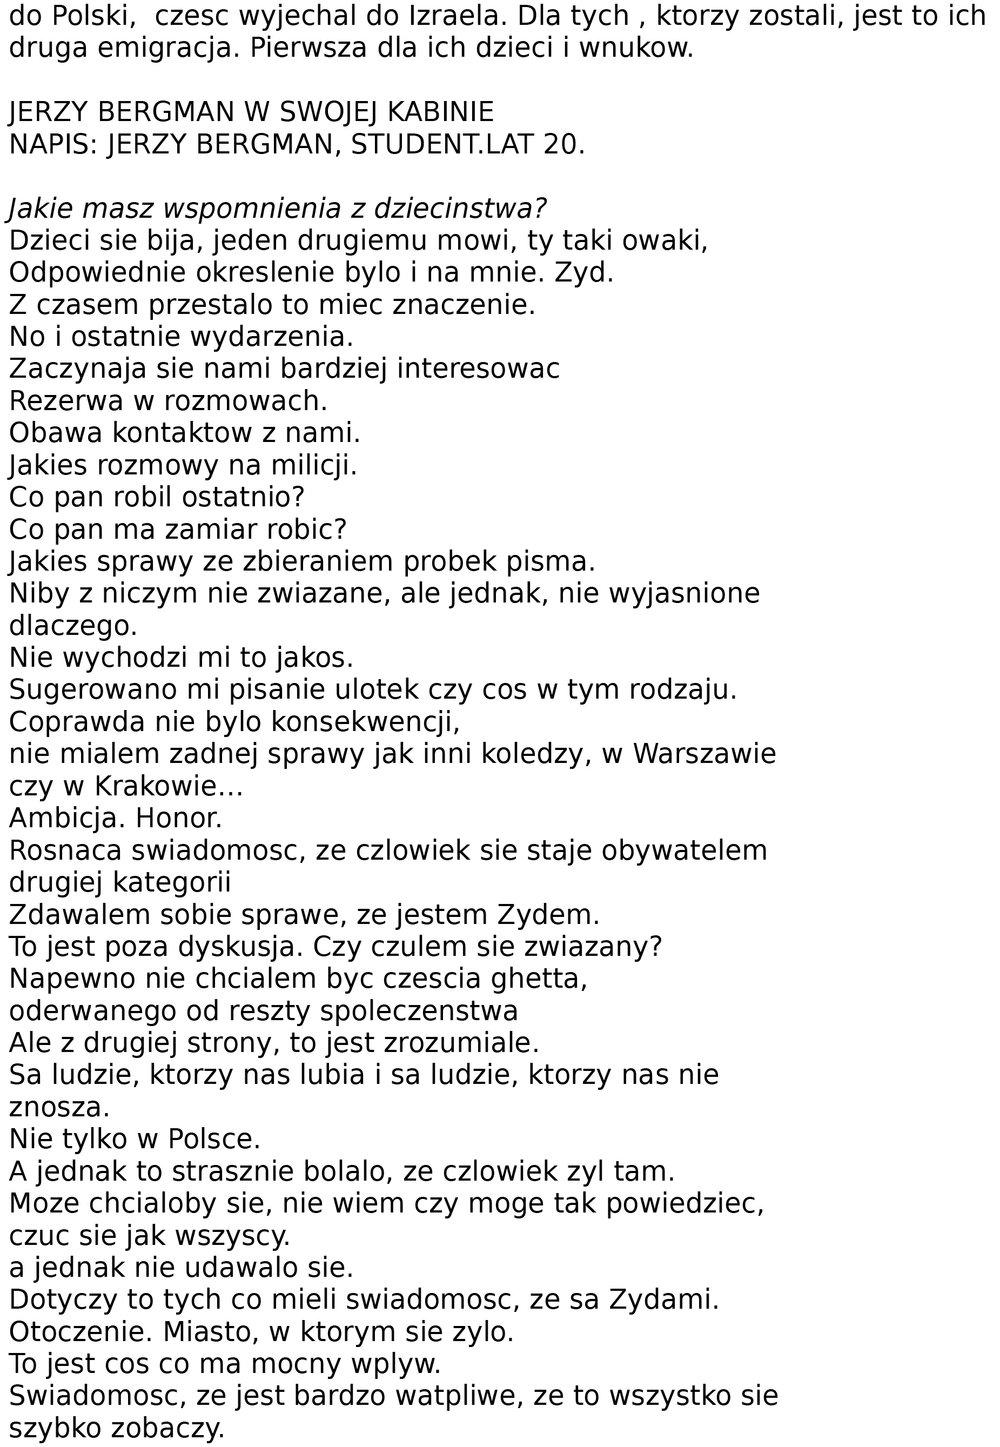 SKIBET-WERSJA-POLSKA-3.jpg